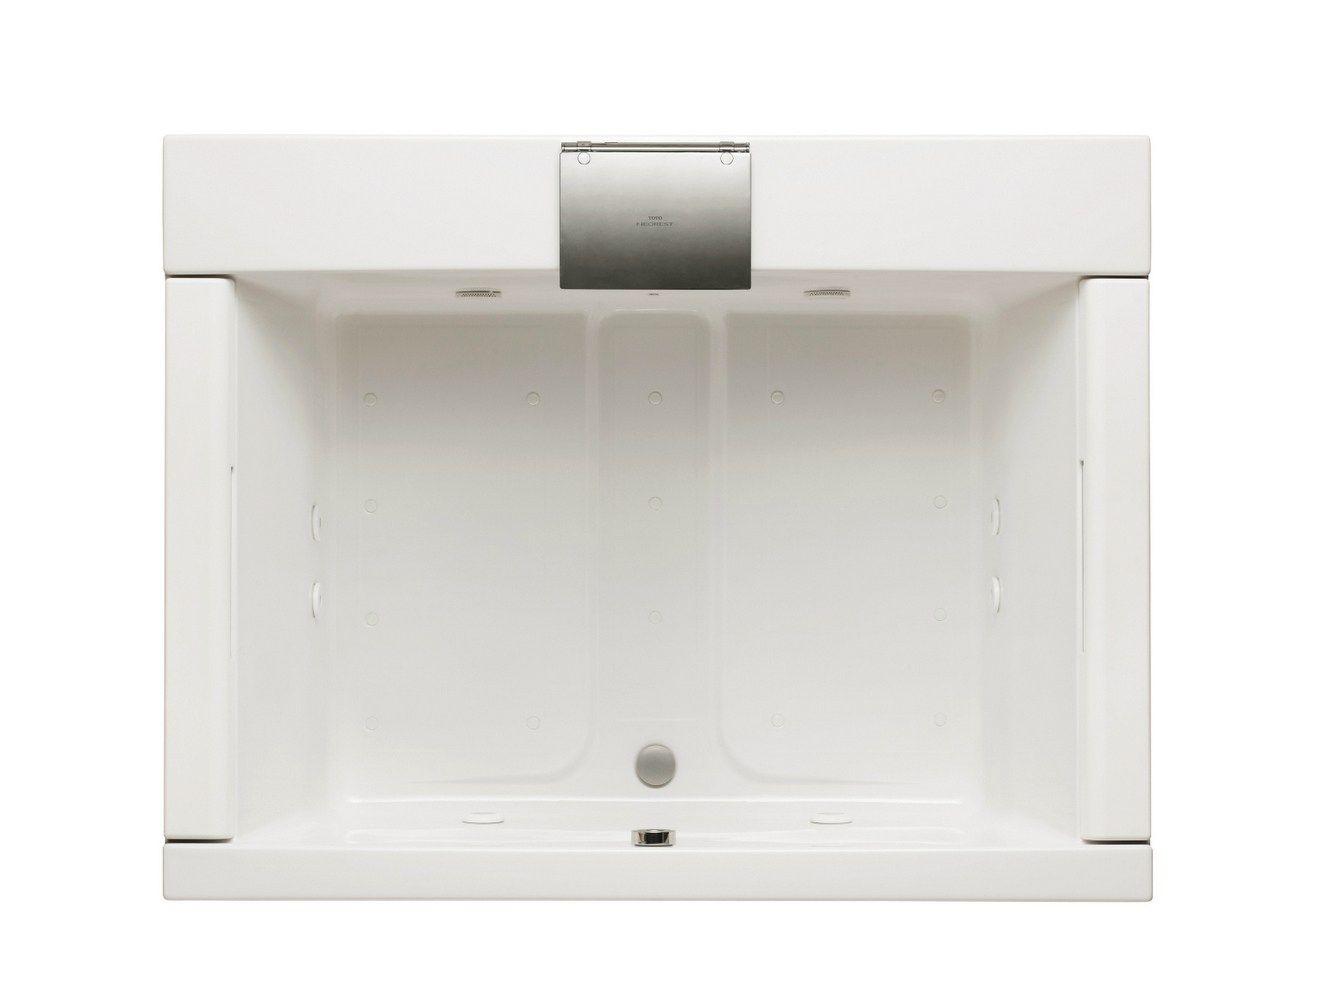 Vasche Da Bagno Misure Standard: Vovell.com disegni parete vendita online. Ti...